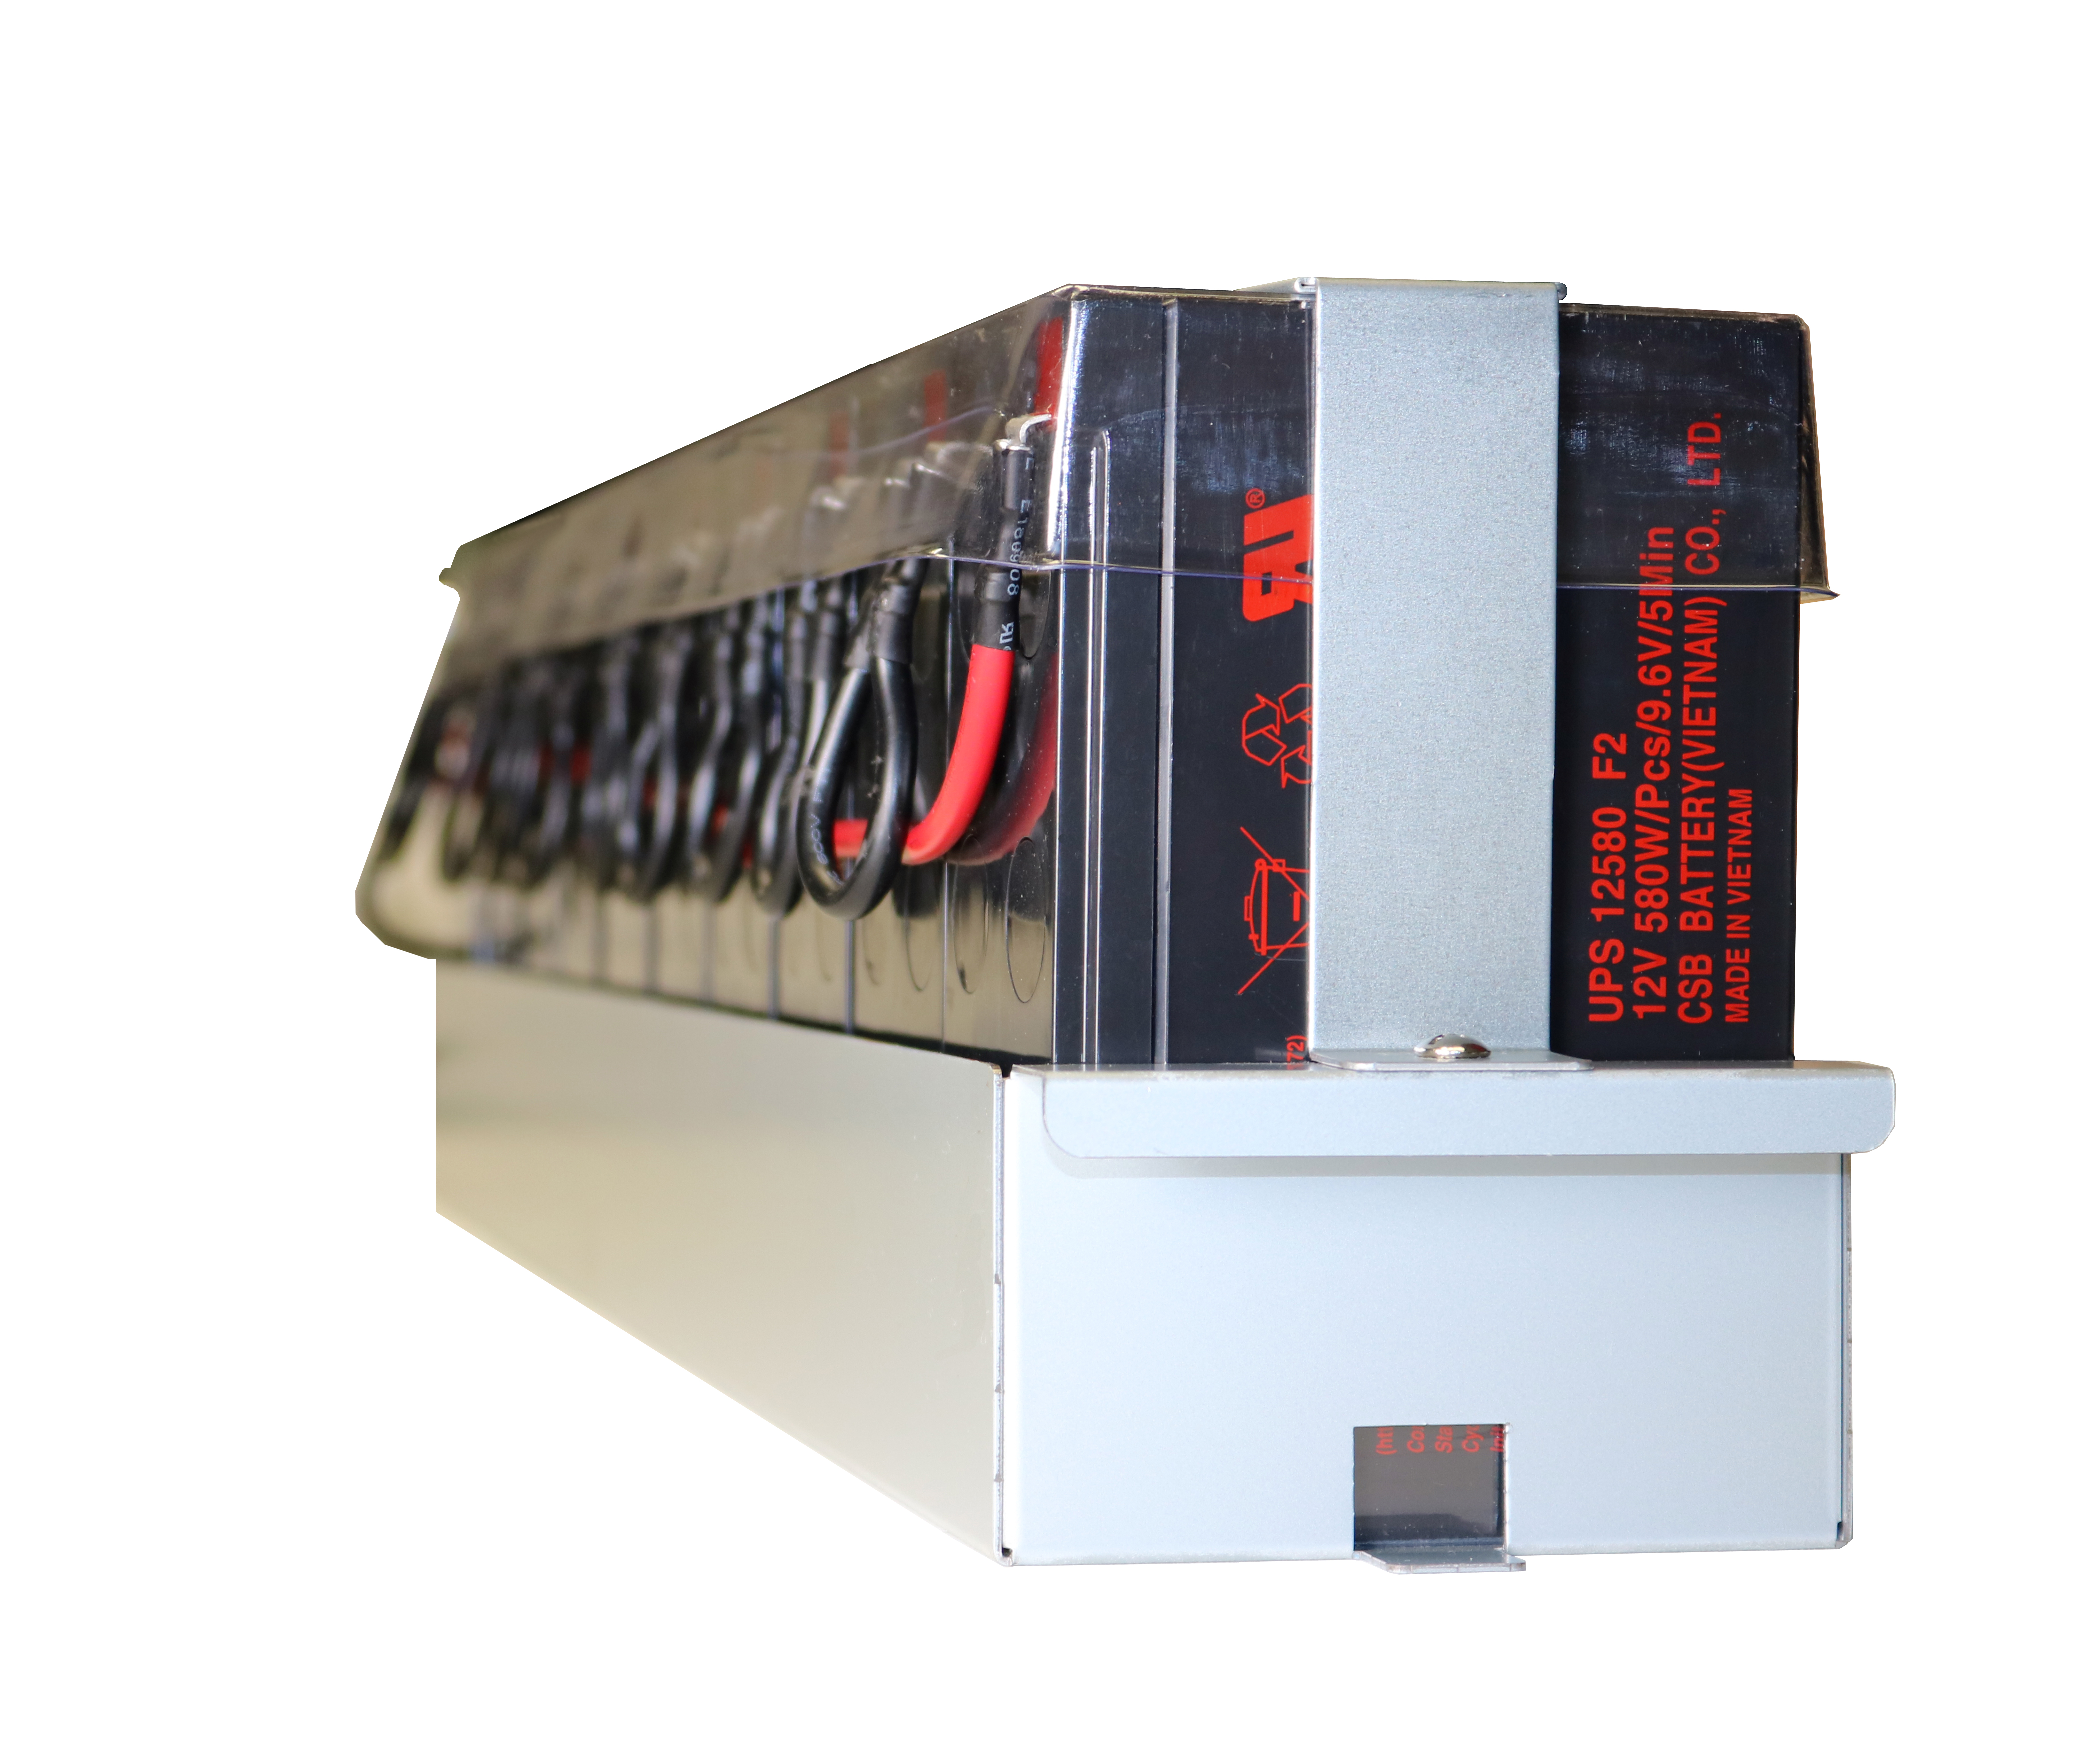 M90 Modular Online UPS | Xtreme Power Conversion